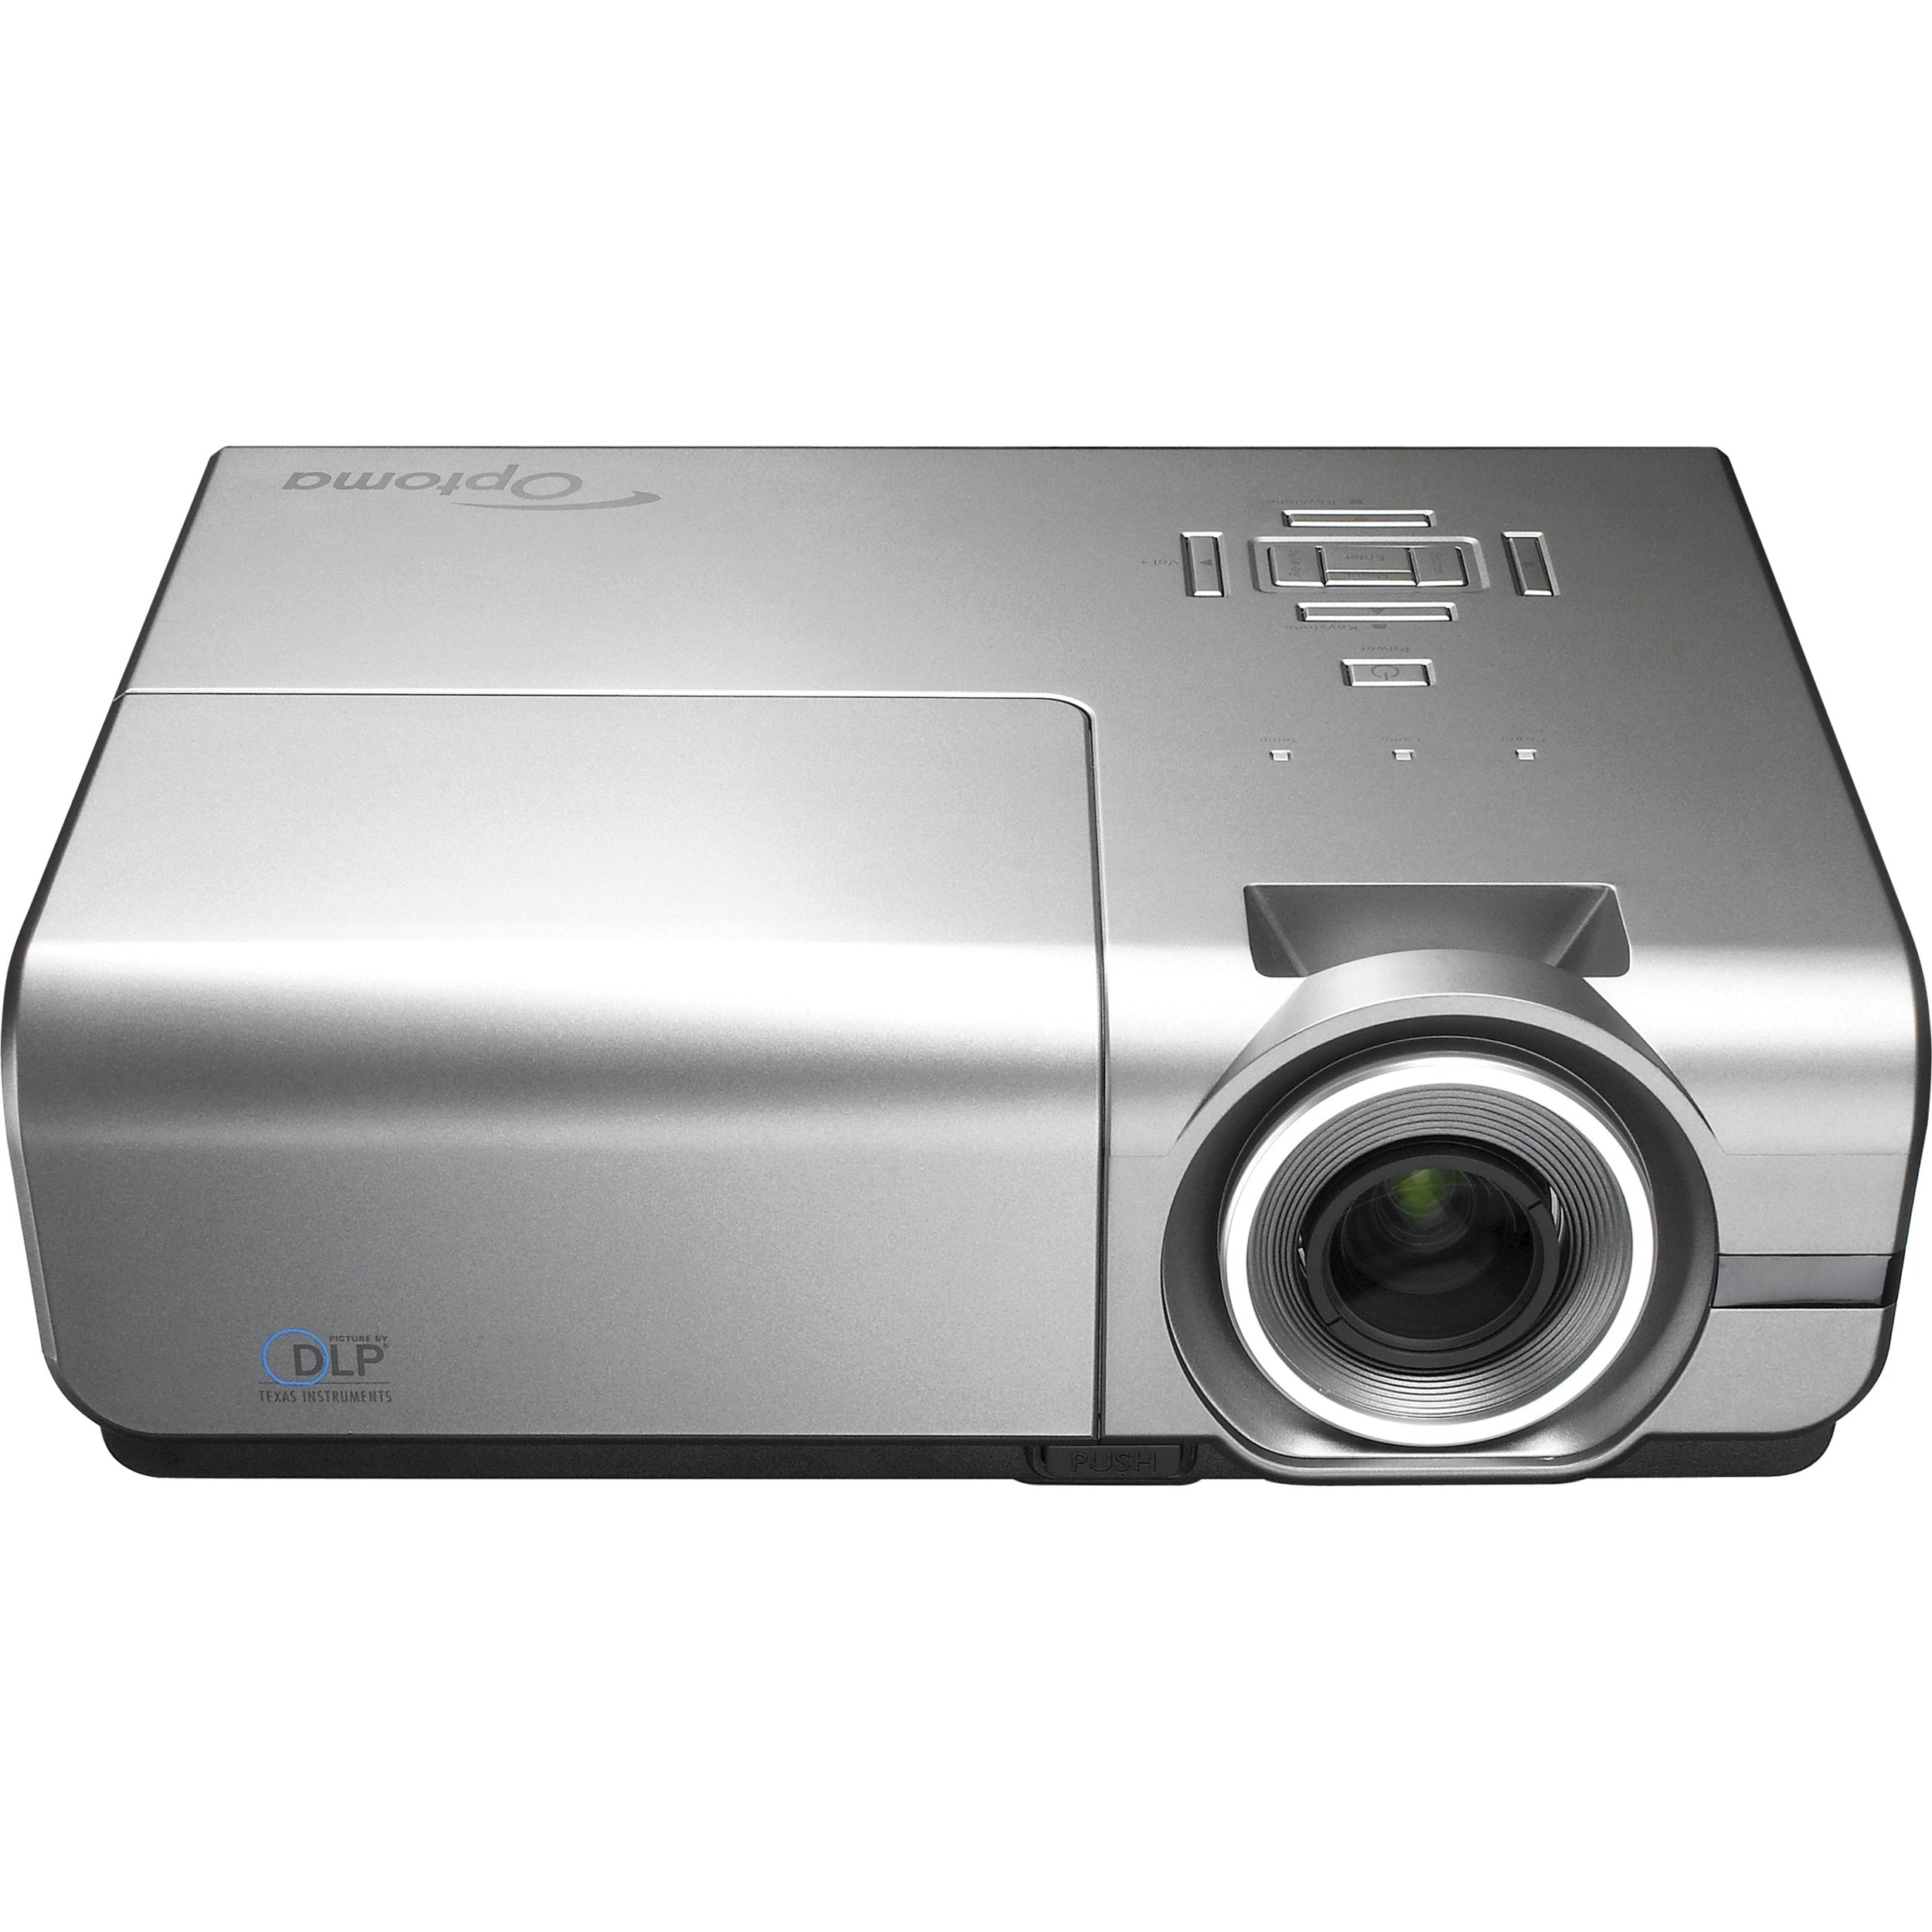 Optoma X600 XGA 6000 Lumen Full 3D DLP Network Projector with HDMI_subImage_1